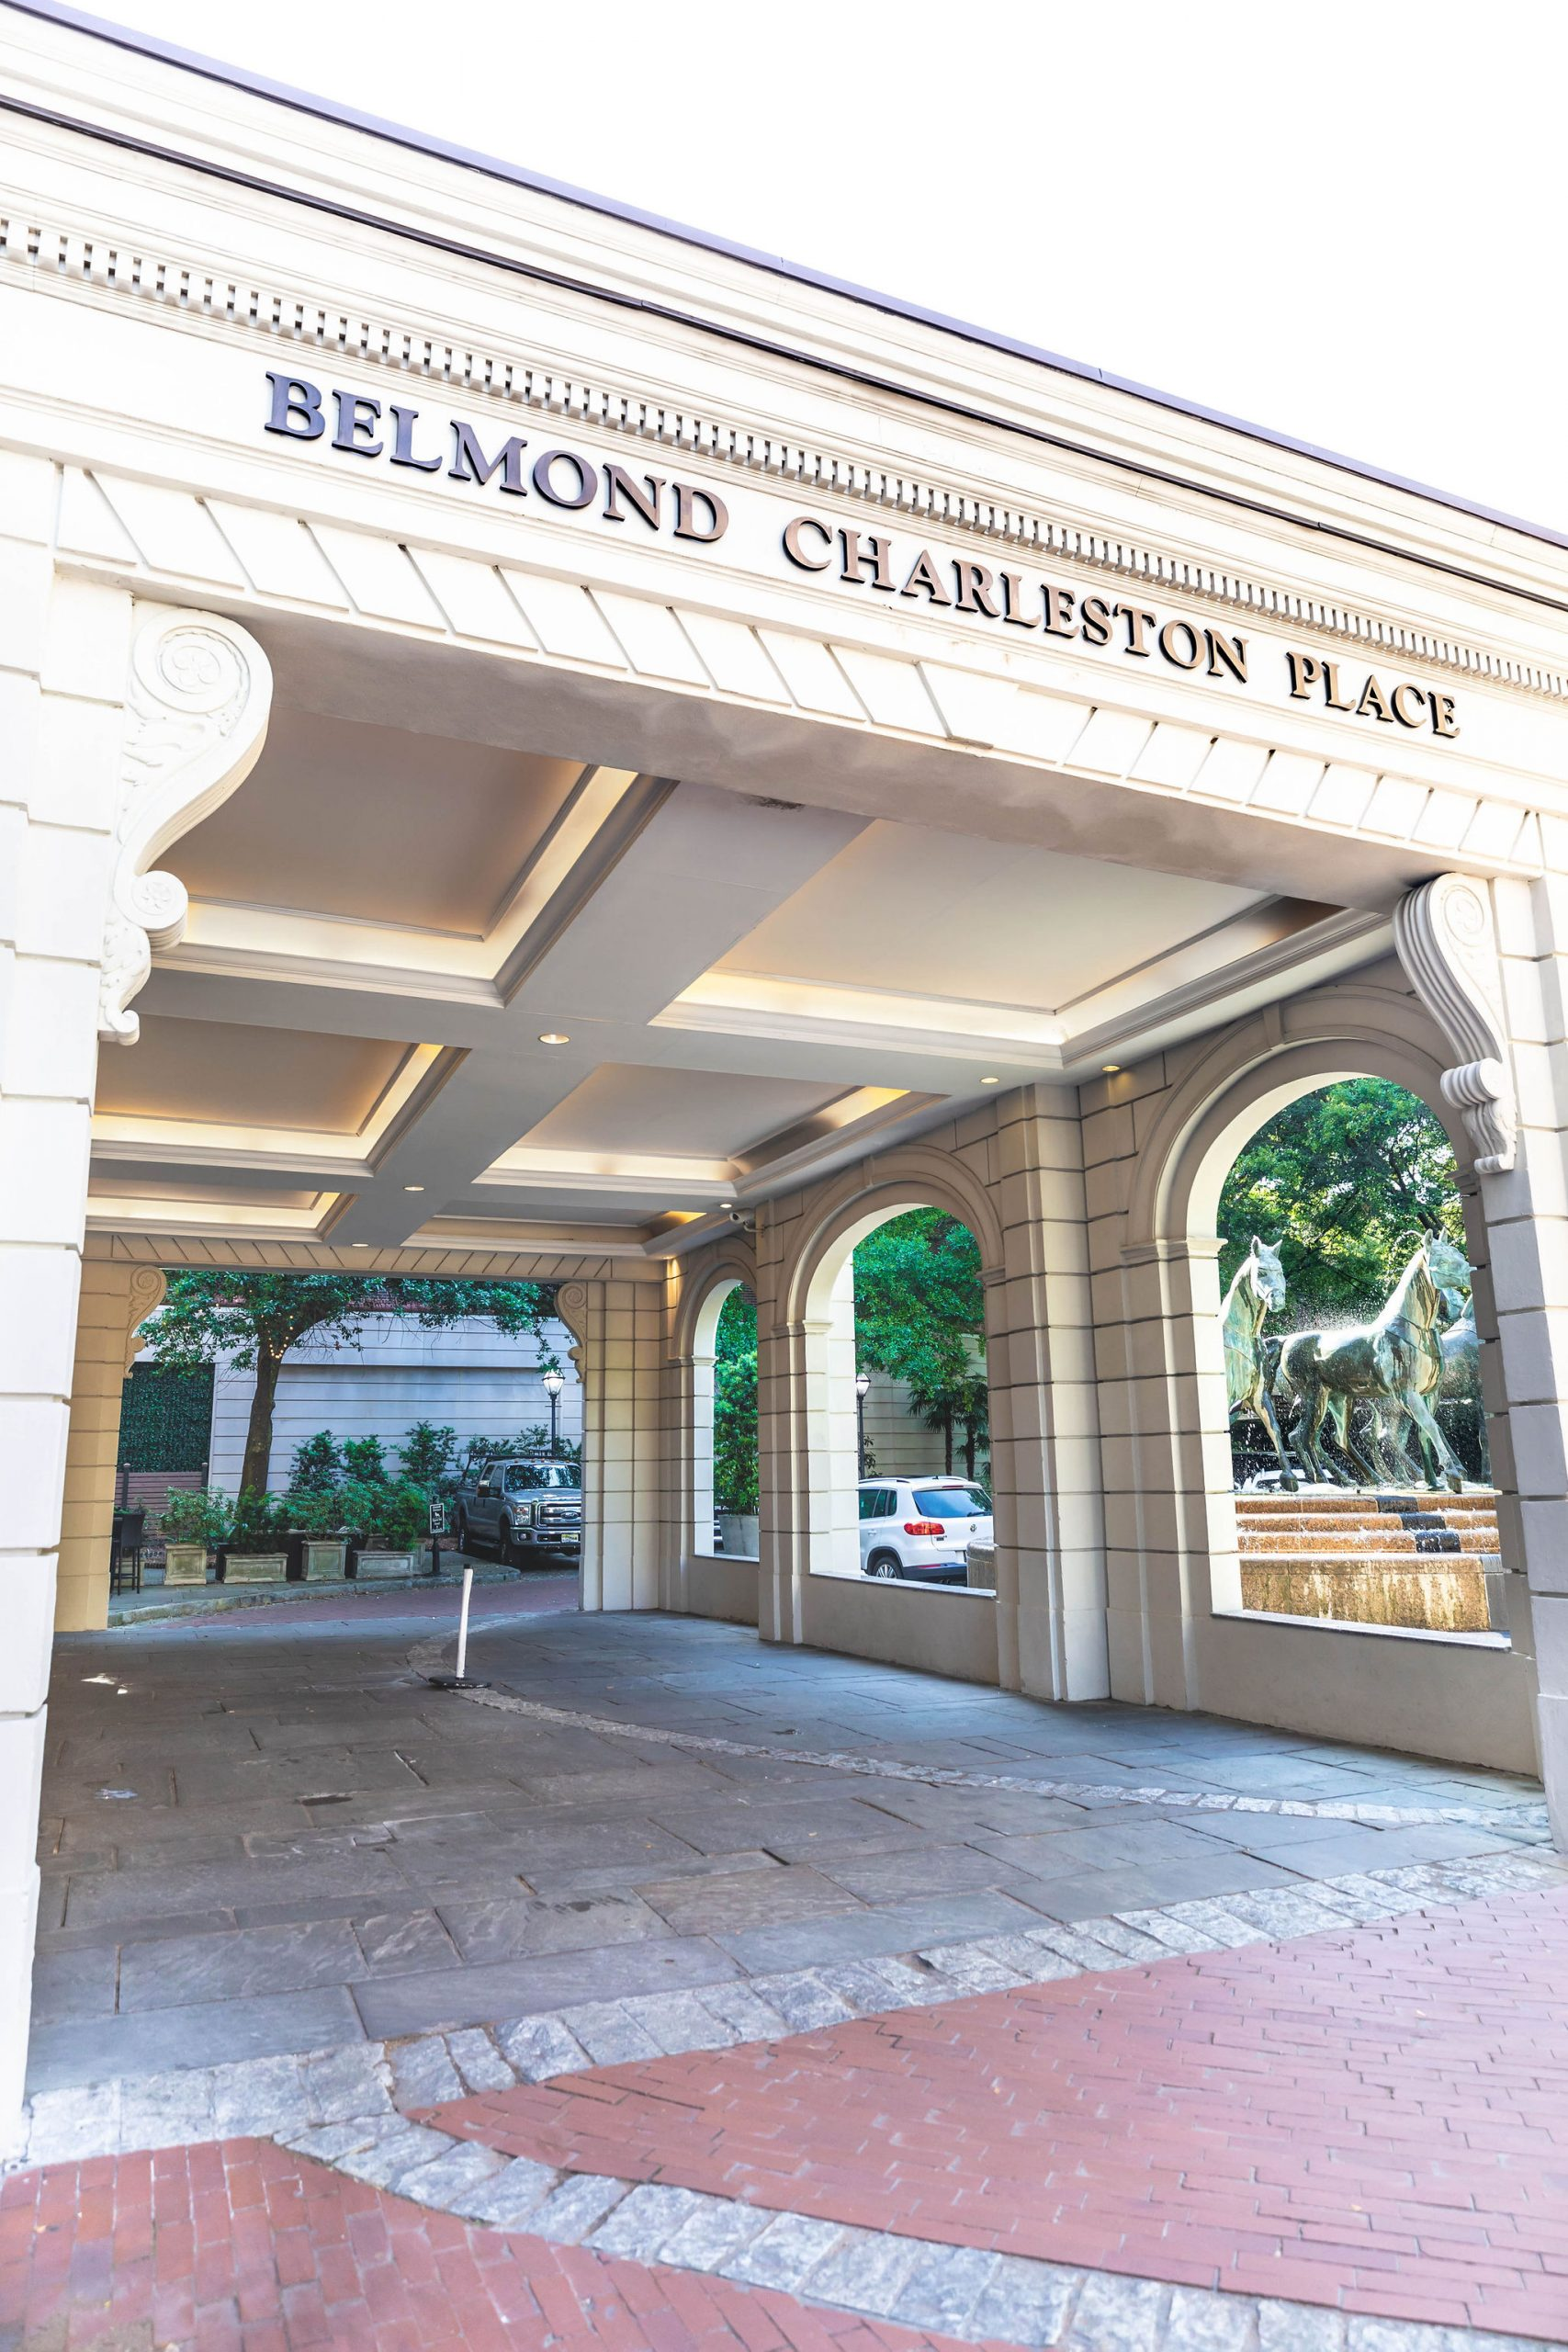 Belmond Charleston Place luxury Hotels of the World South Carolina Resorts Written & Photographed by Annie Fairfax